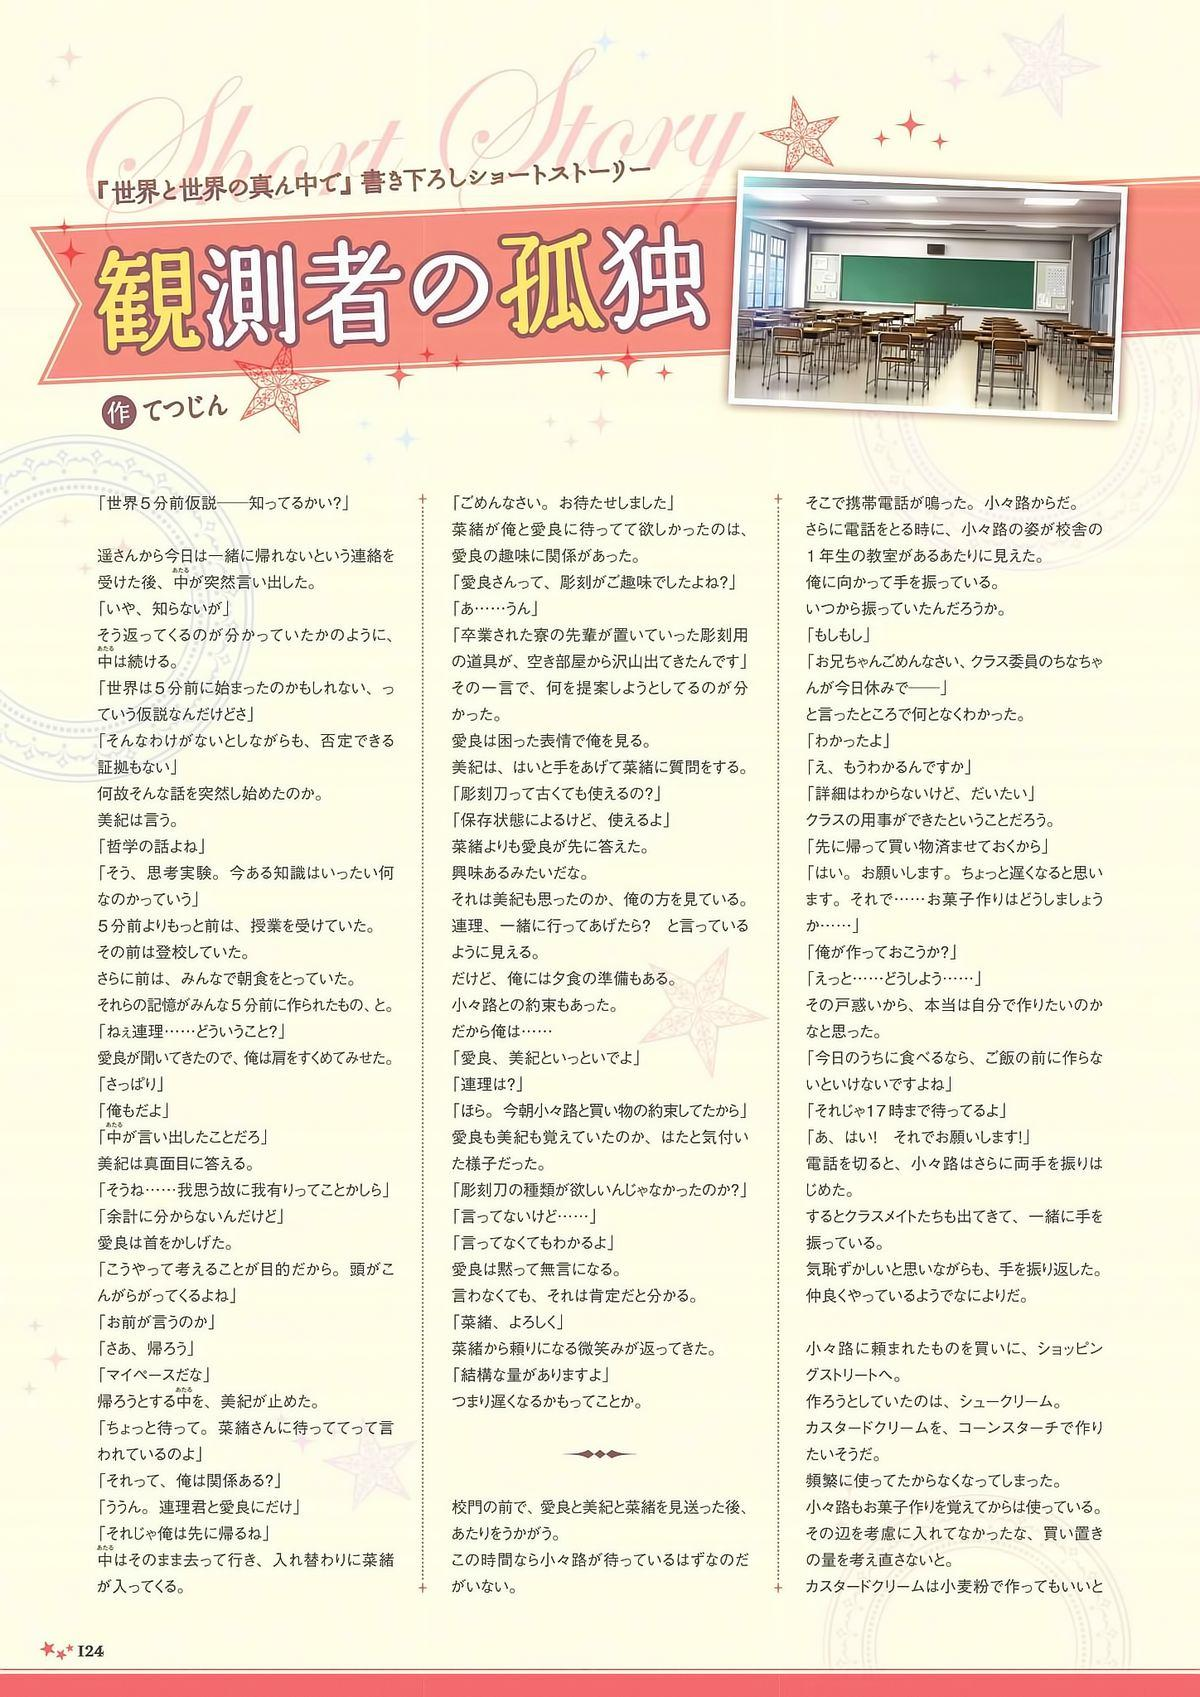 Sekai to Sekai no Mannaka de Visual Fanbook 121